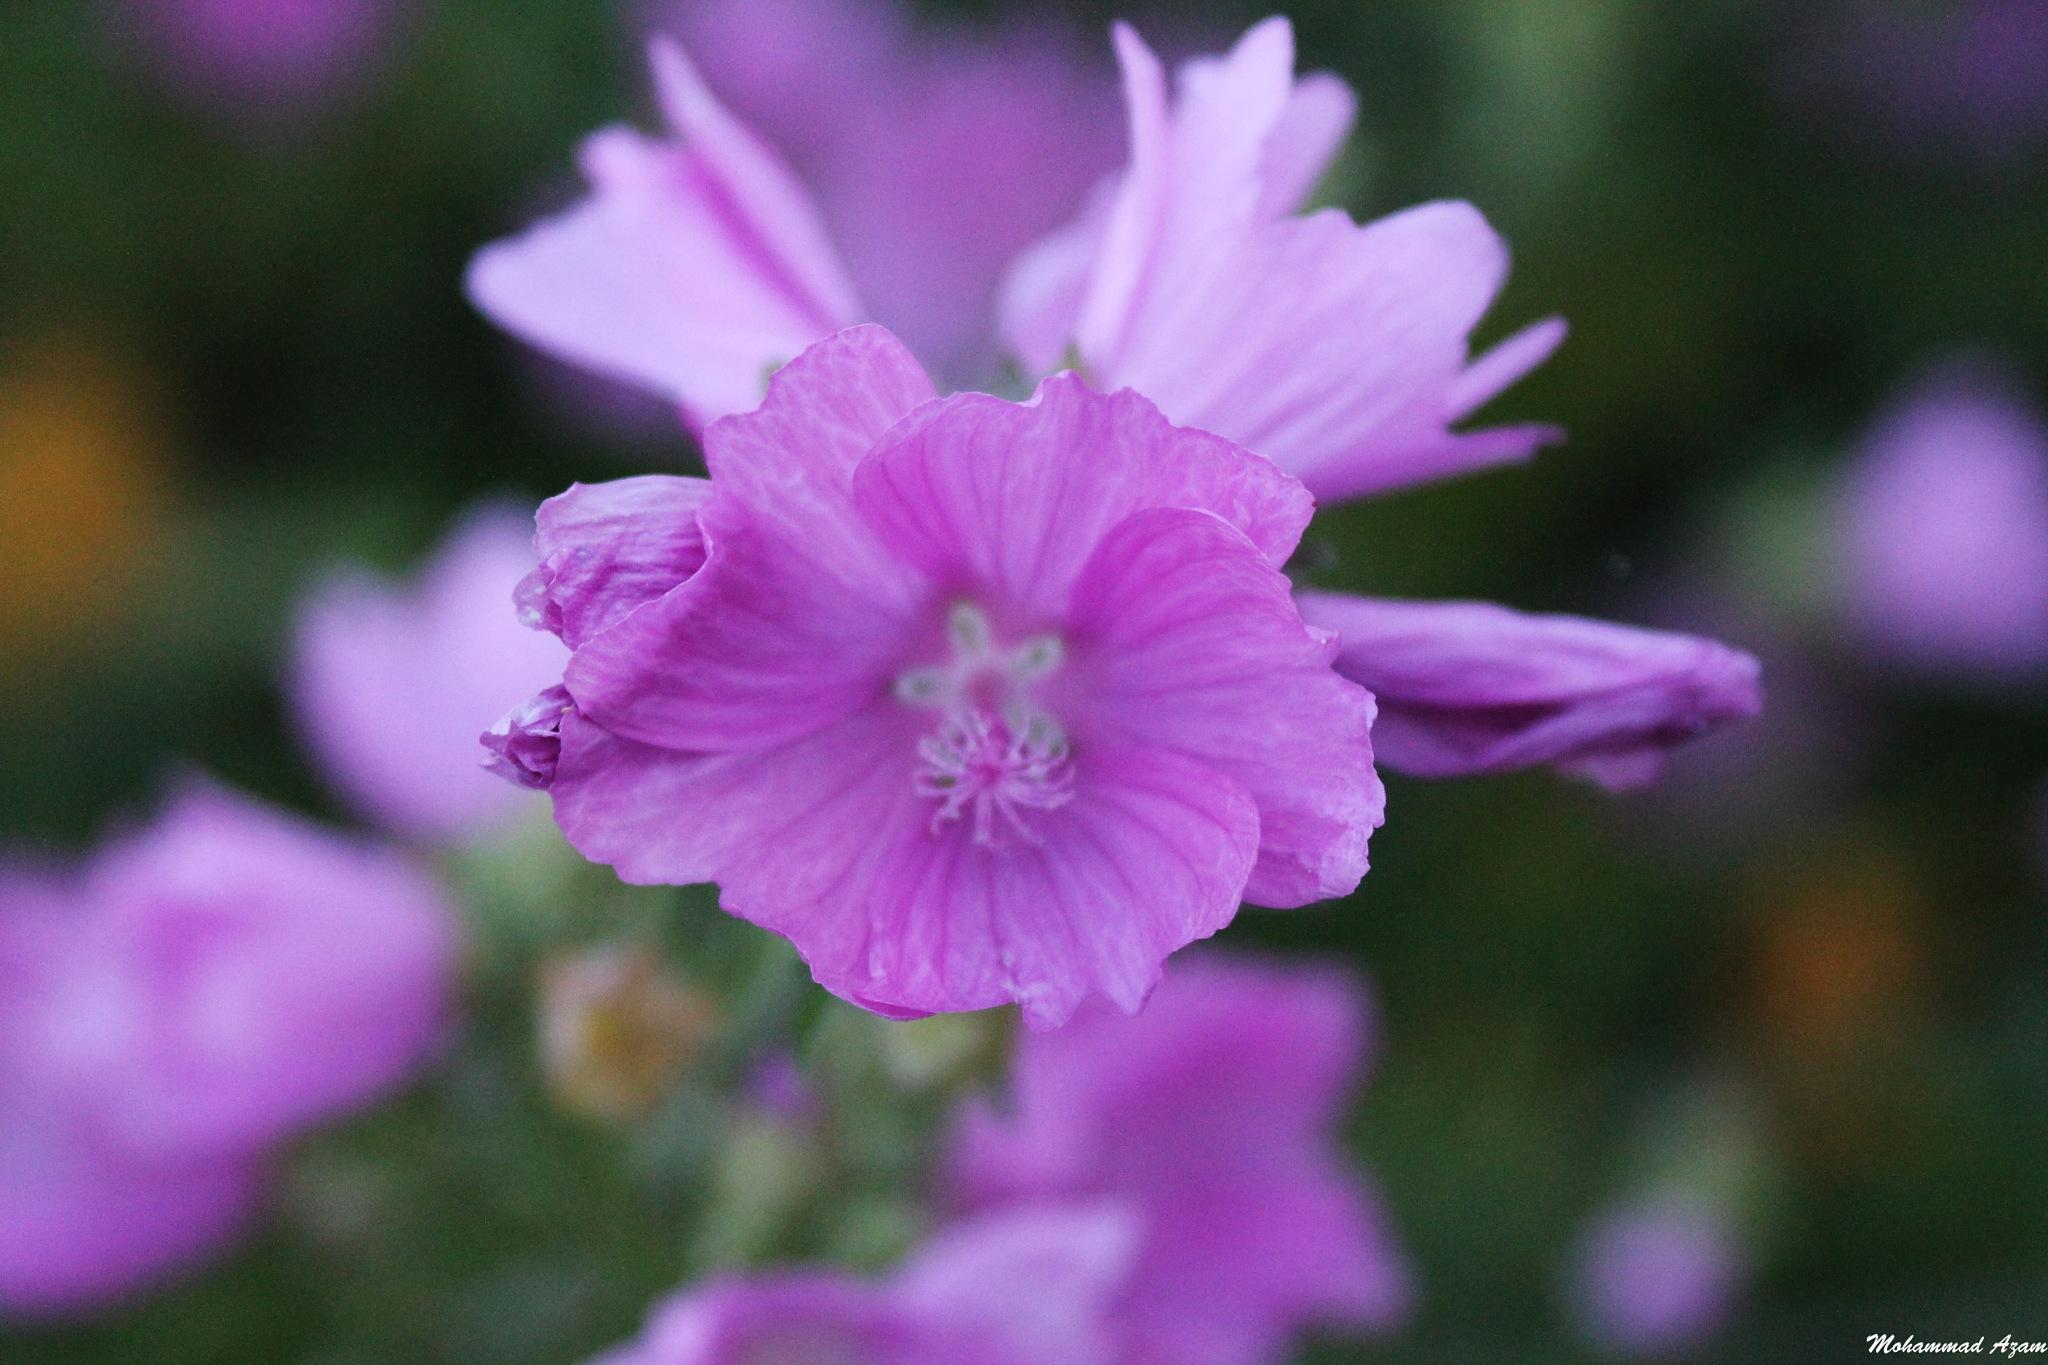 Flower 35 by Mohammad Azam